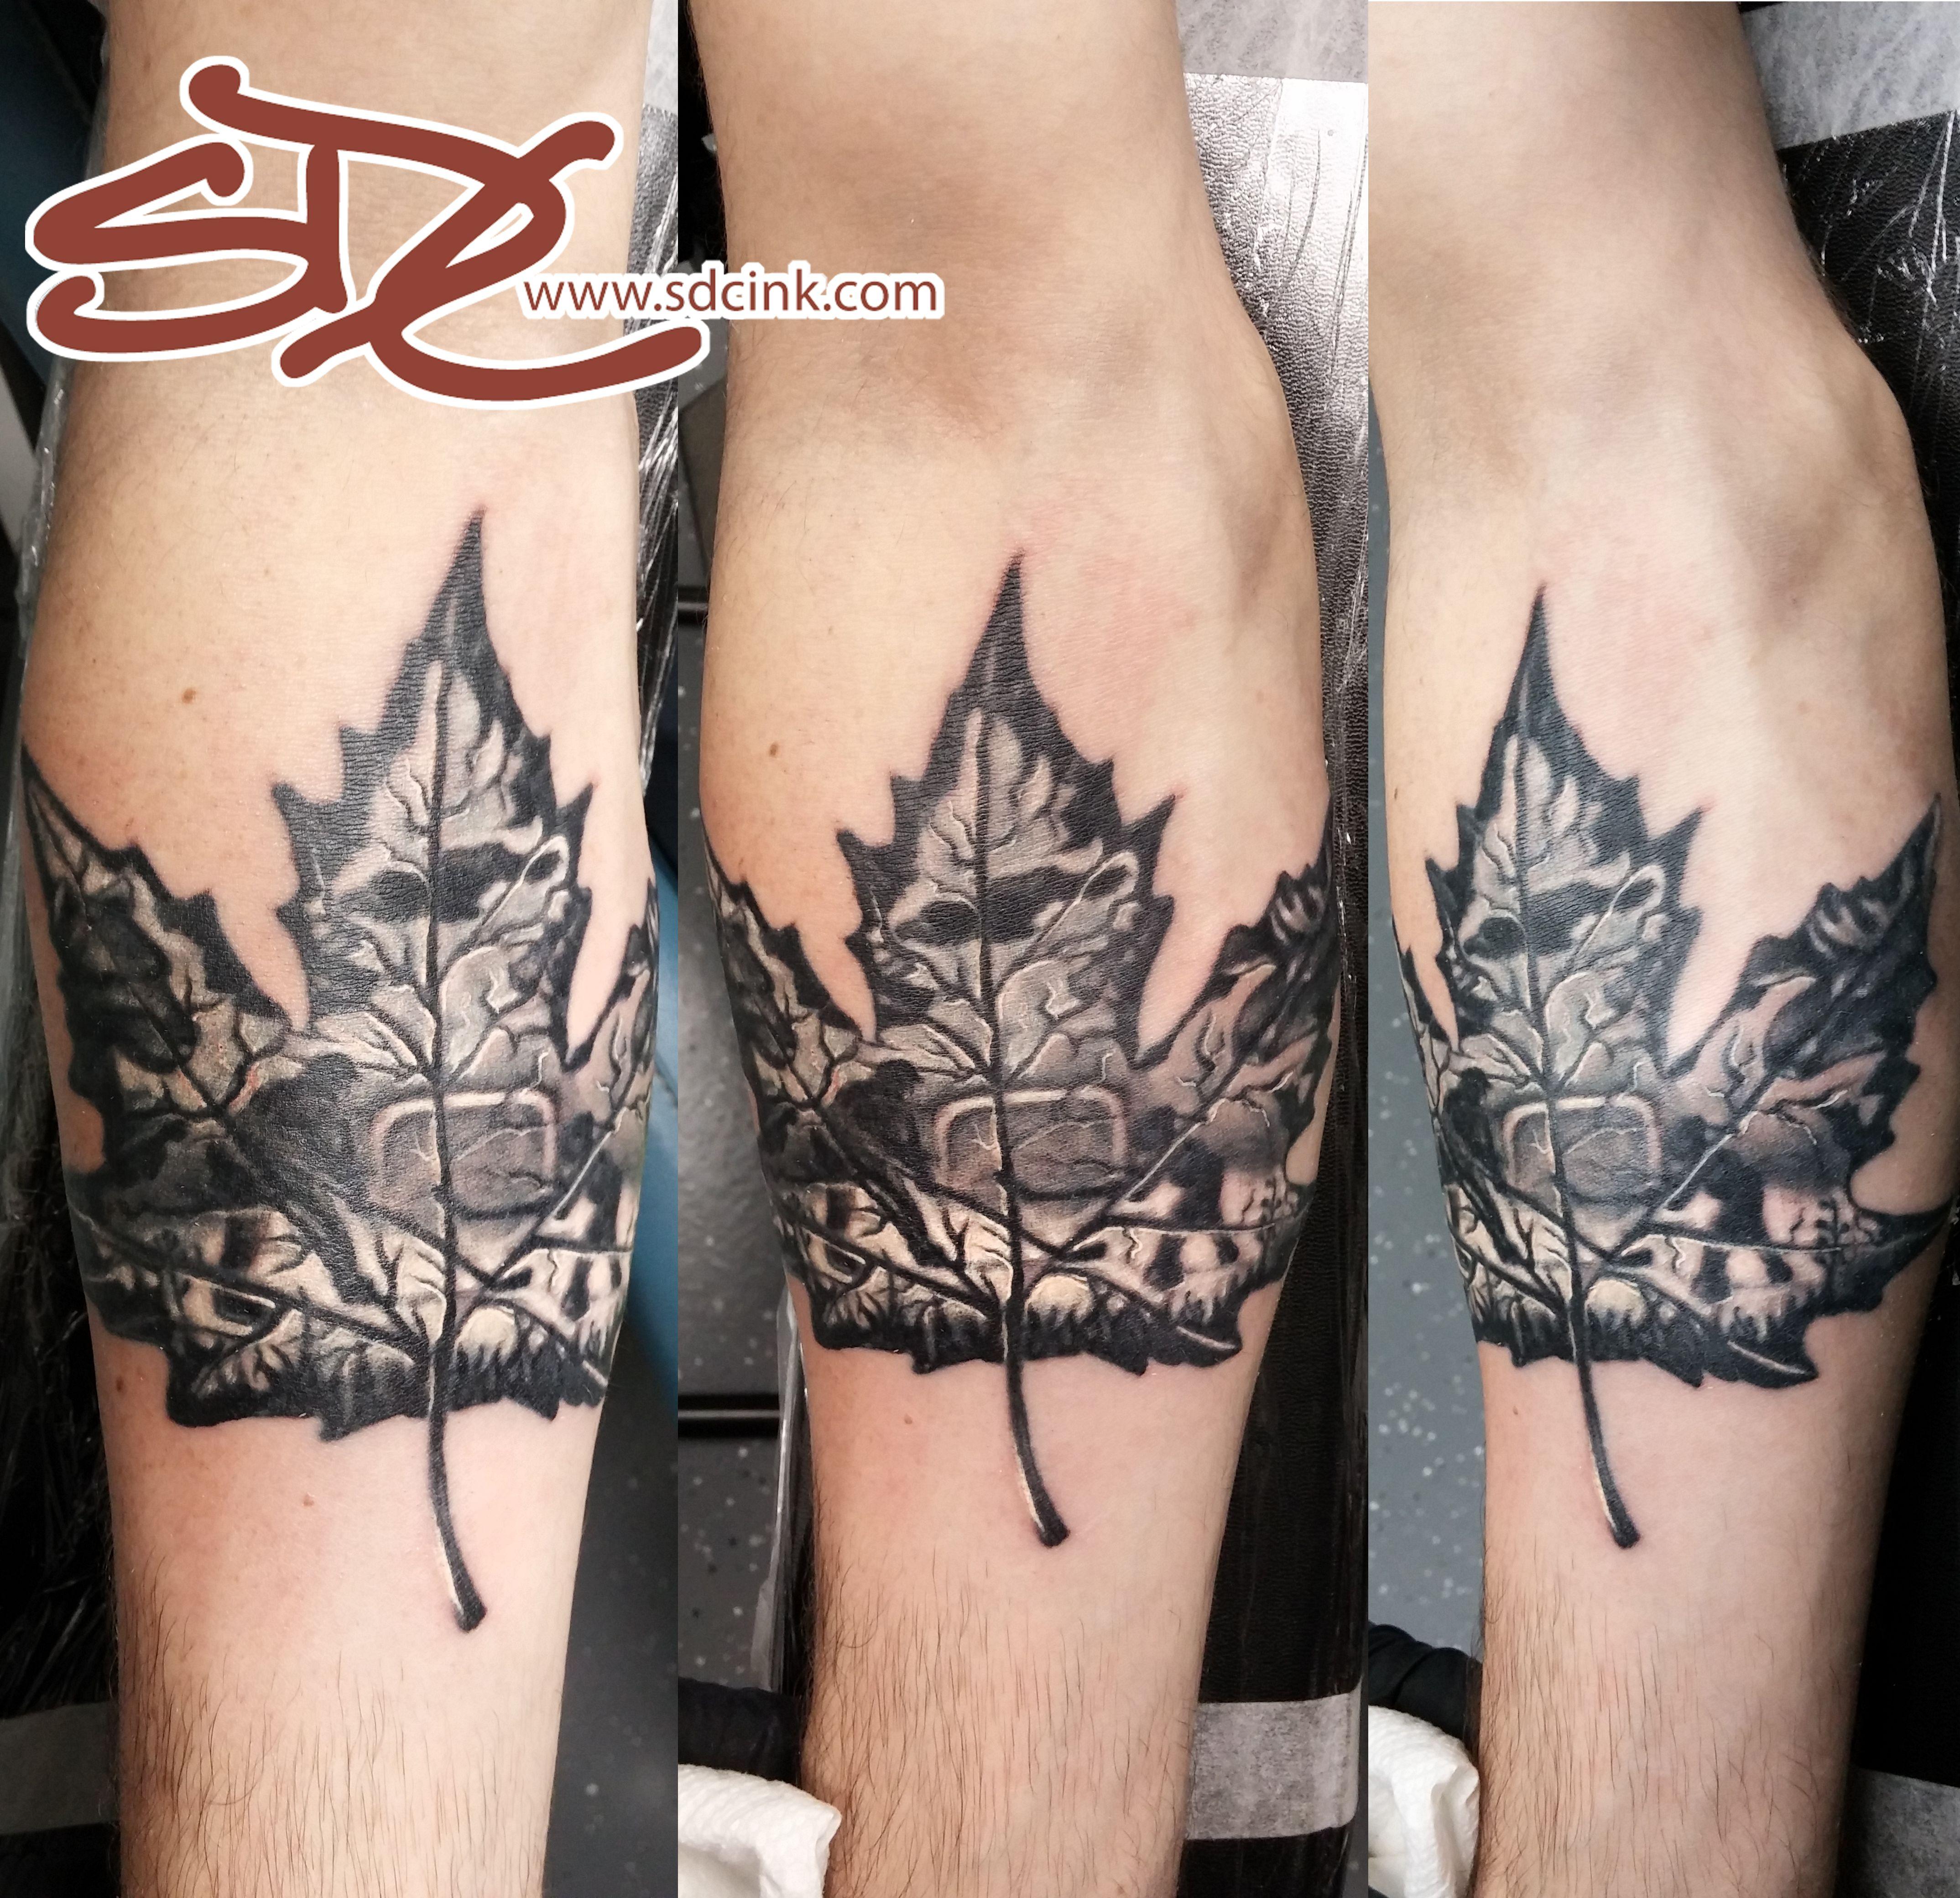 Canadian Love Maple Leaf Tattoo With Hockey And Animals By Sonia Debenetti Carlisle Hockey Tattoo Tattoos Sleeve Tattoos